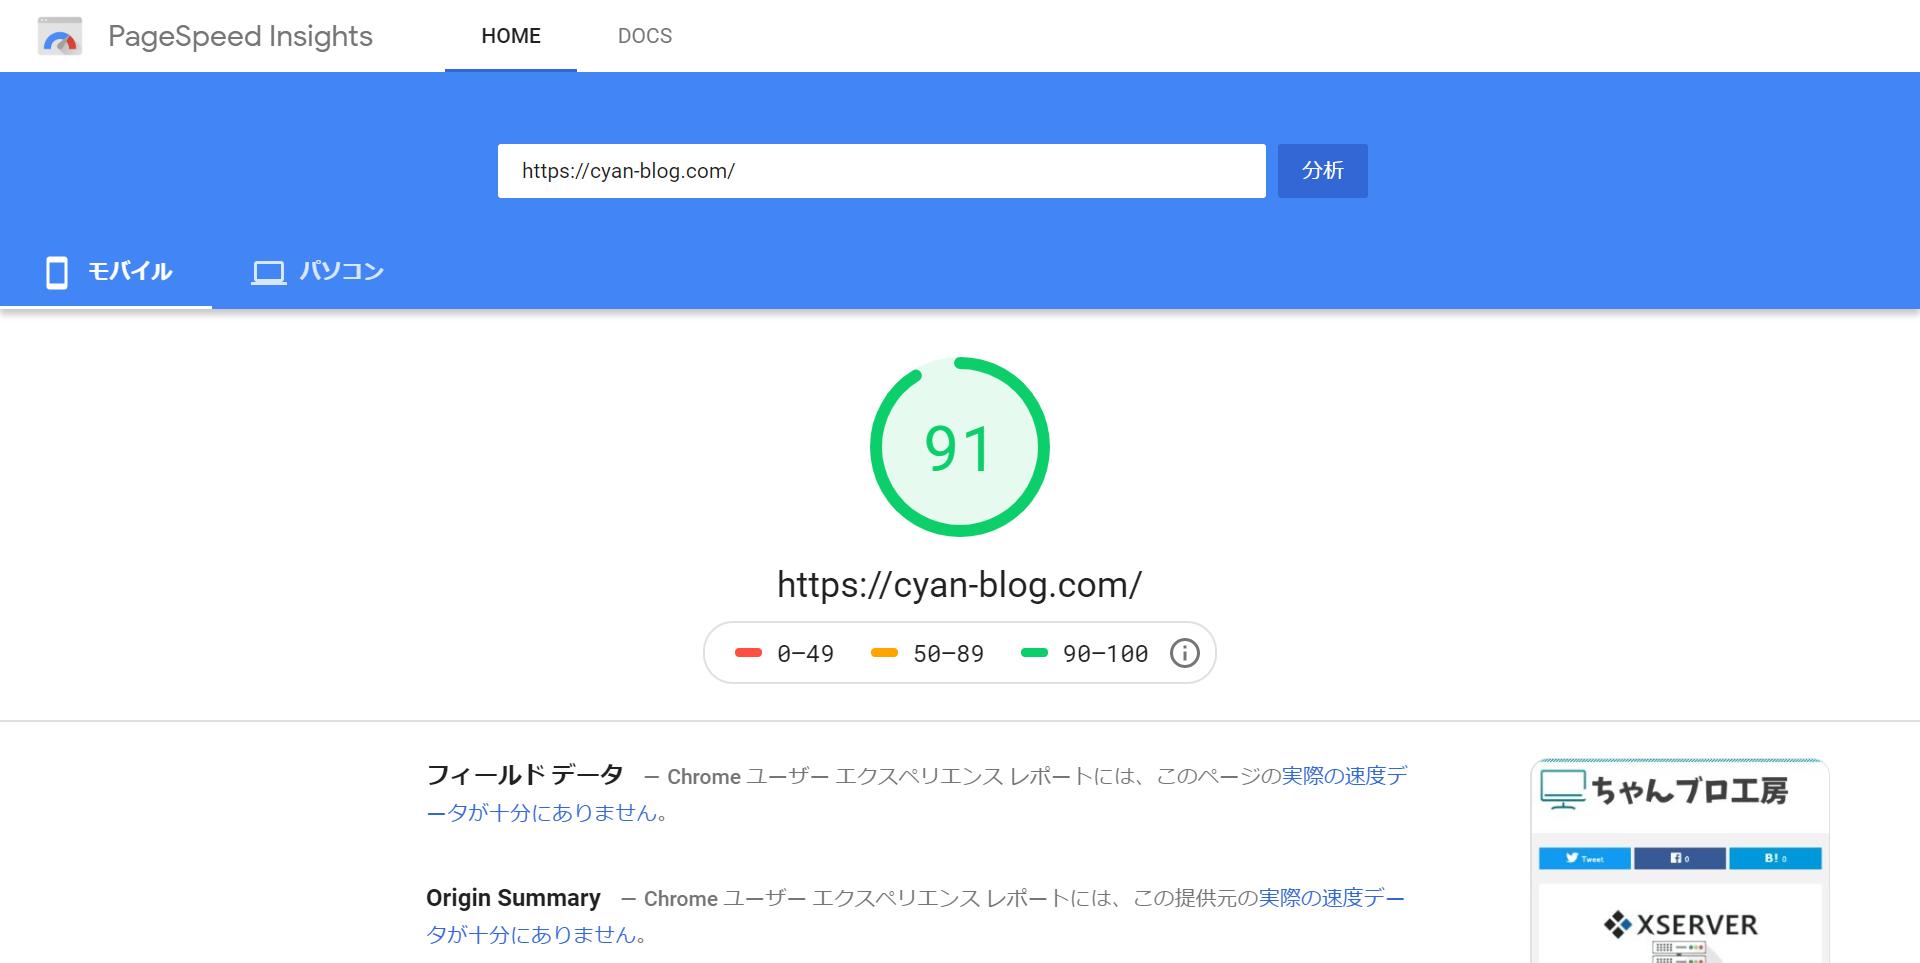 PageSpeed Insights(ページスピード インサイト)のトップ画面